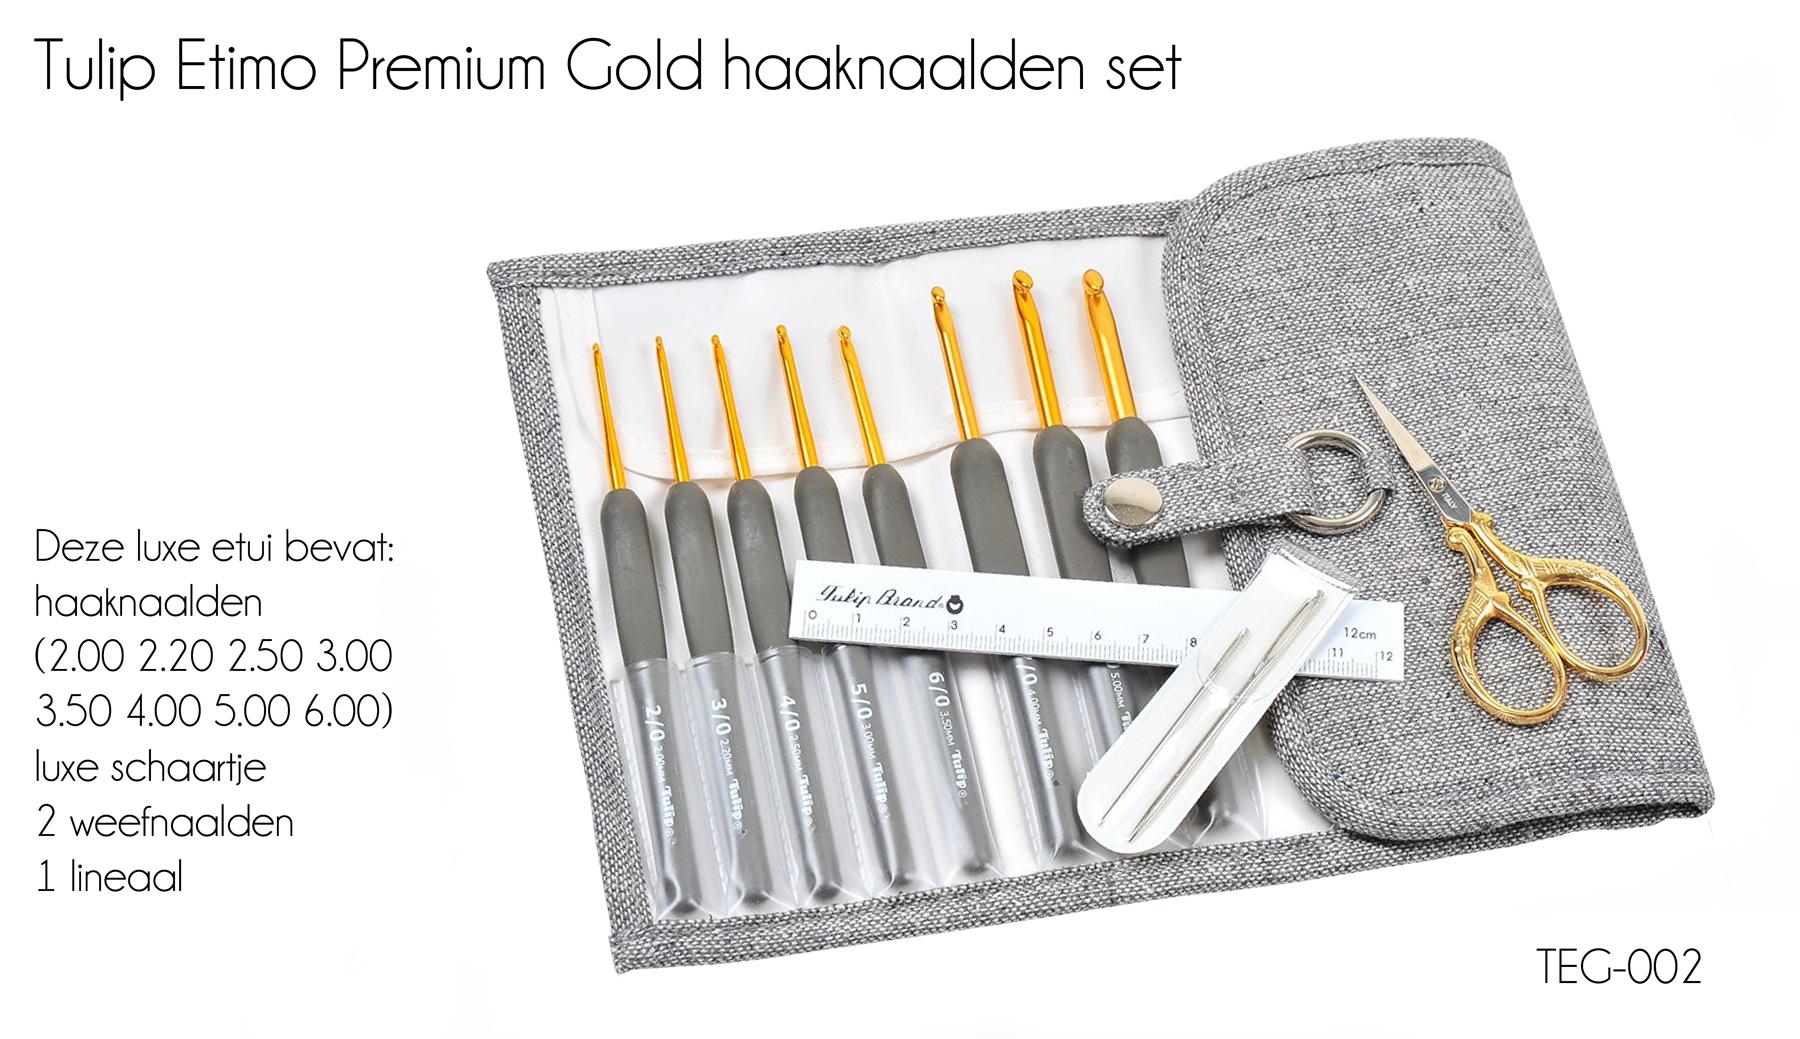 TULIP ETIMO PREMIUM GOLD HAAKNAALDEN SET